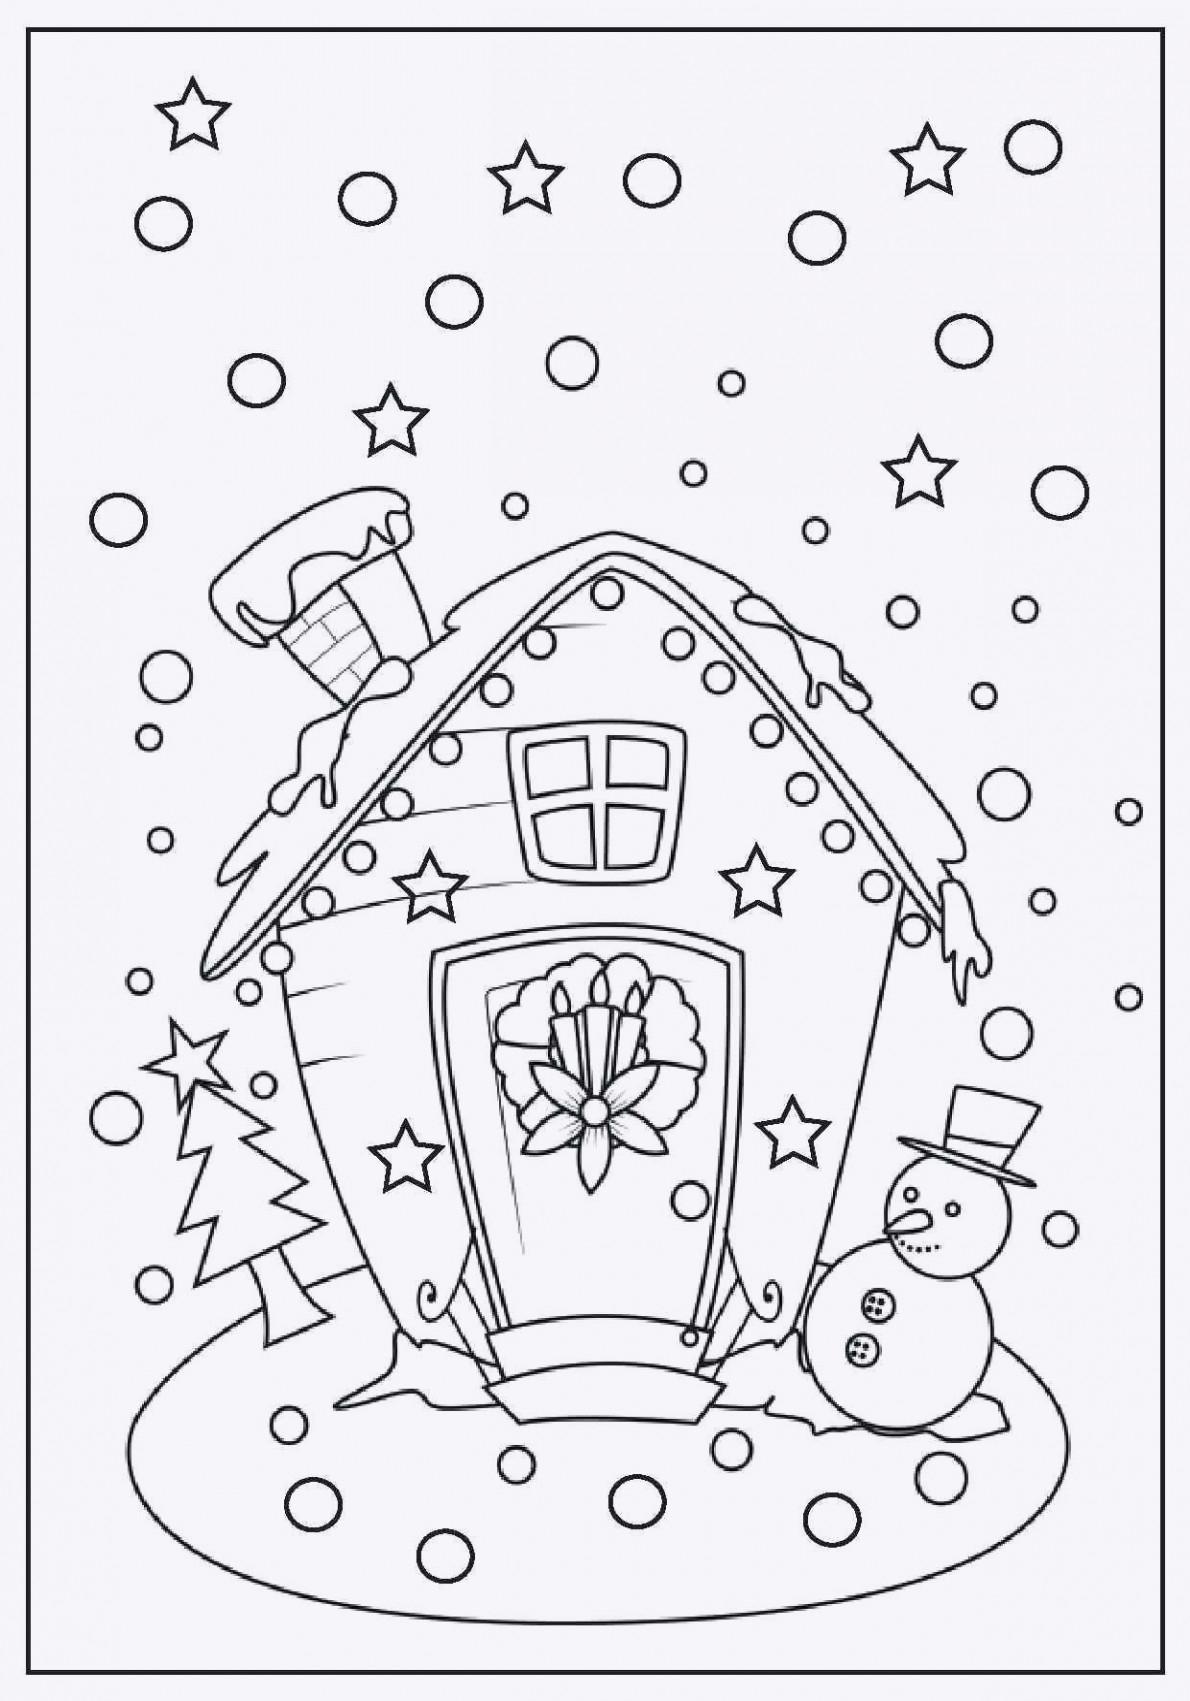 Crayon Coloring Pages Printable Coloring Crayon Coloring Pages Ba Cart Box Page Inspirational